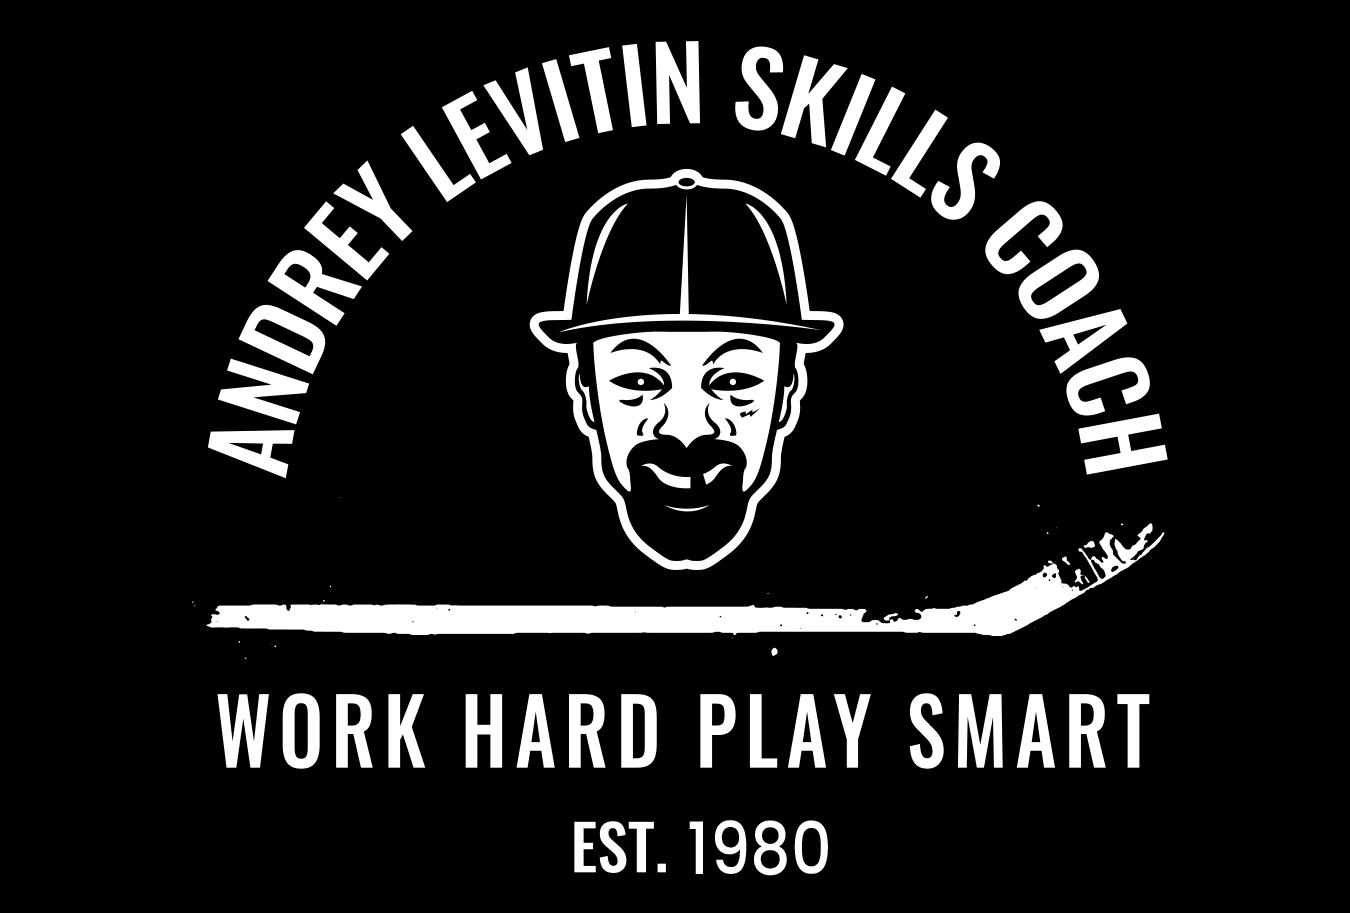 LEVITIN ANDREY SKILLS COACH